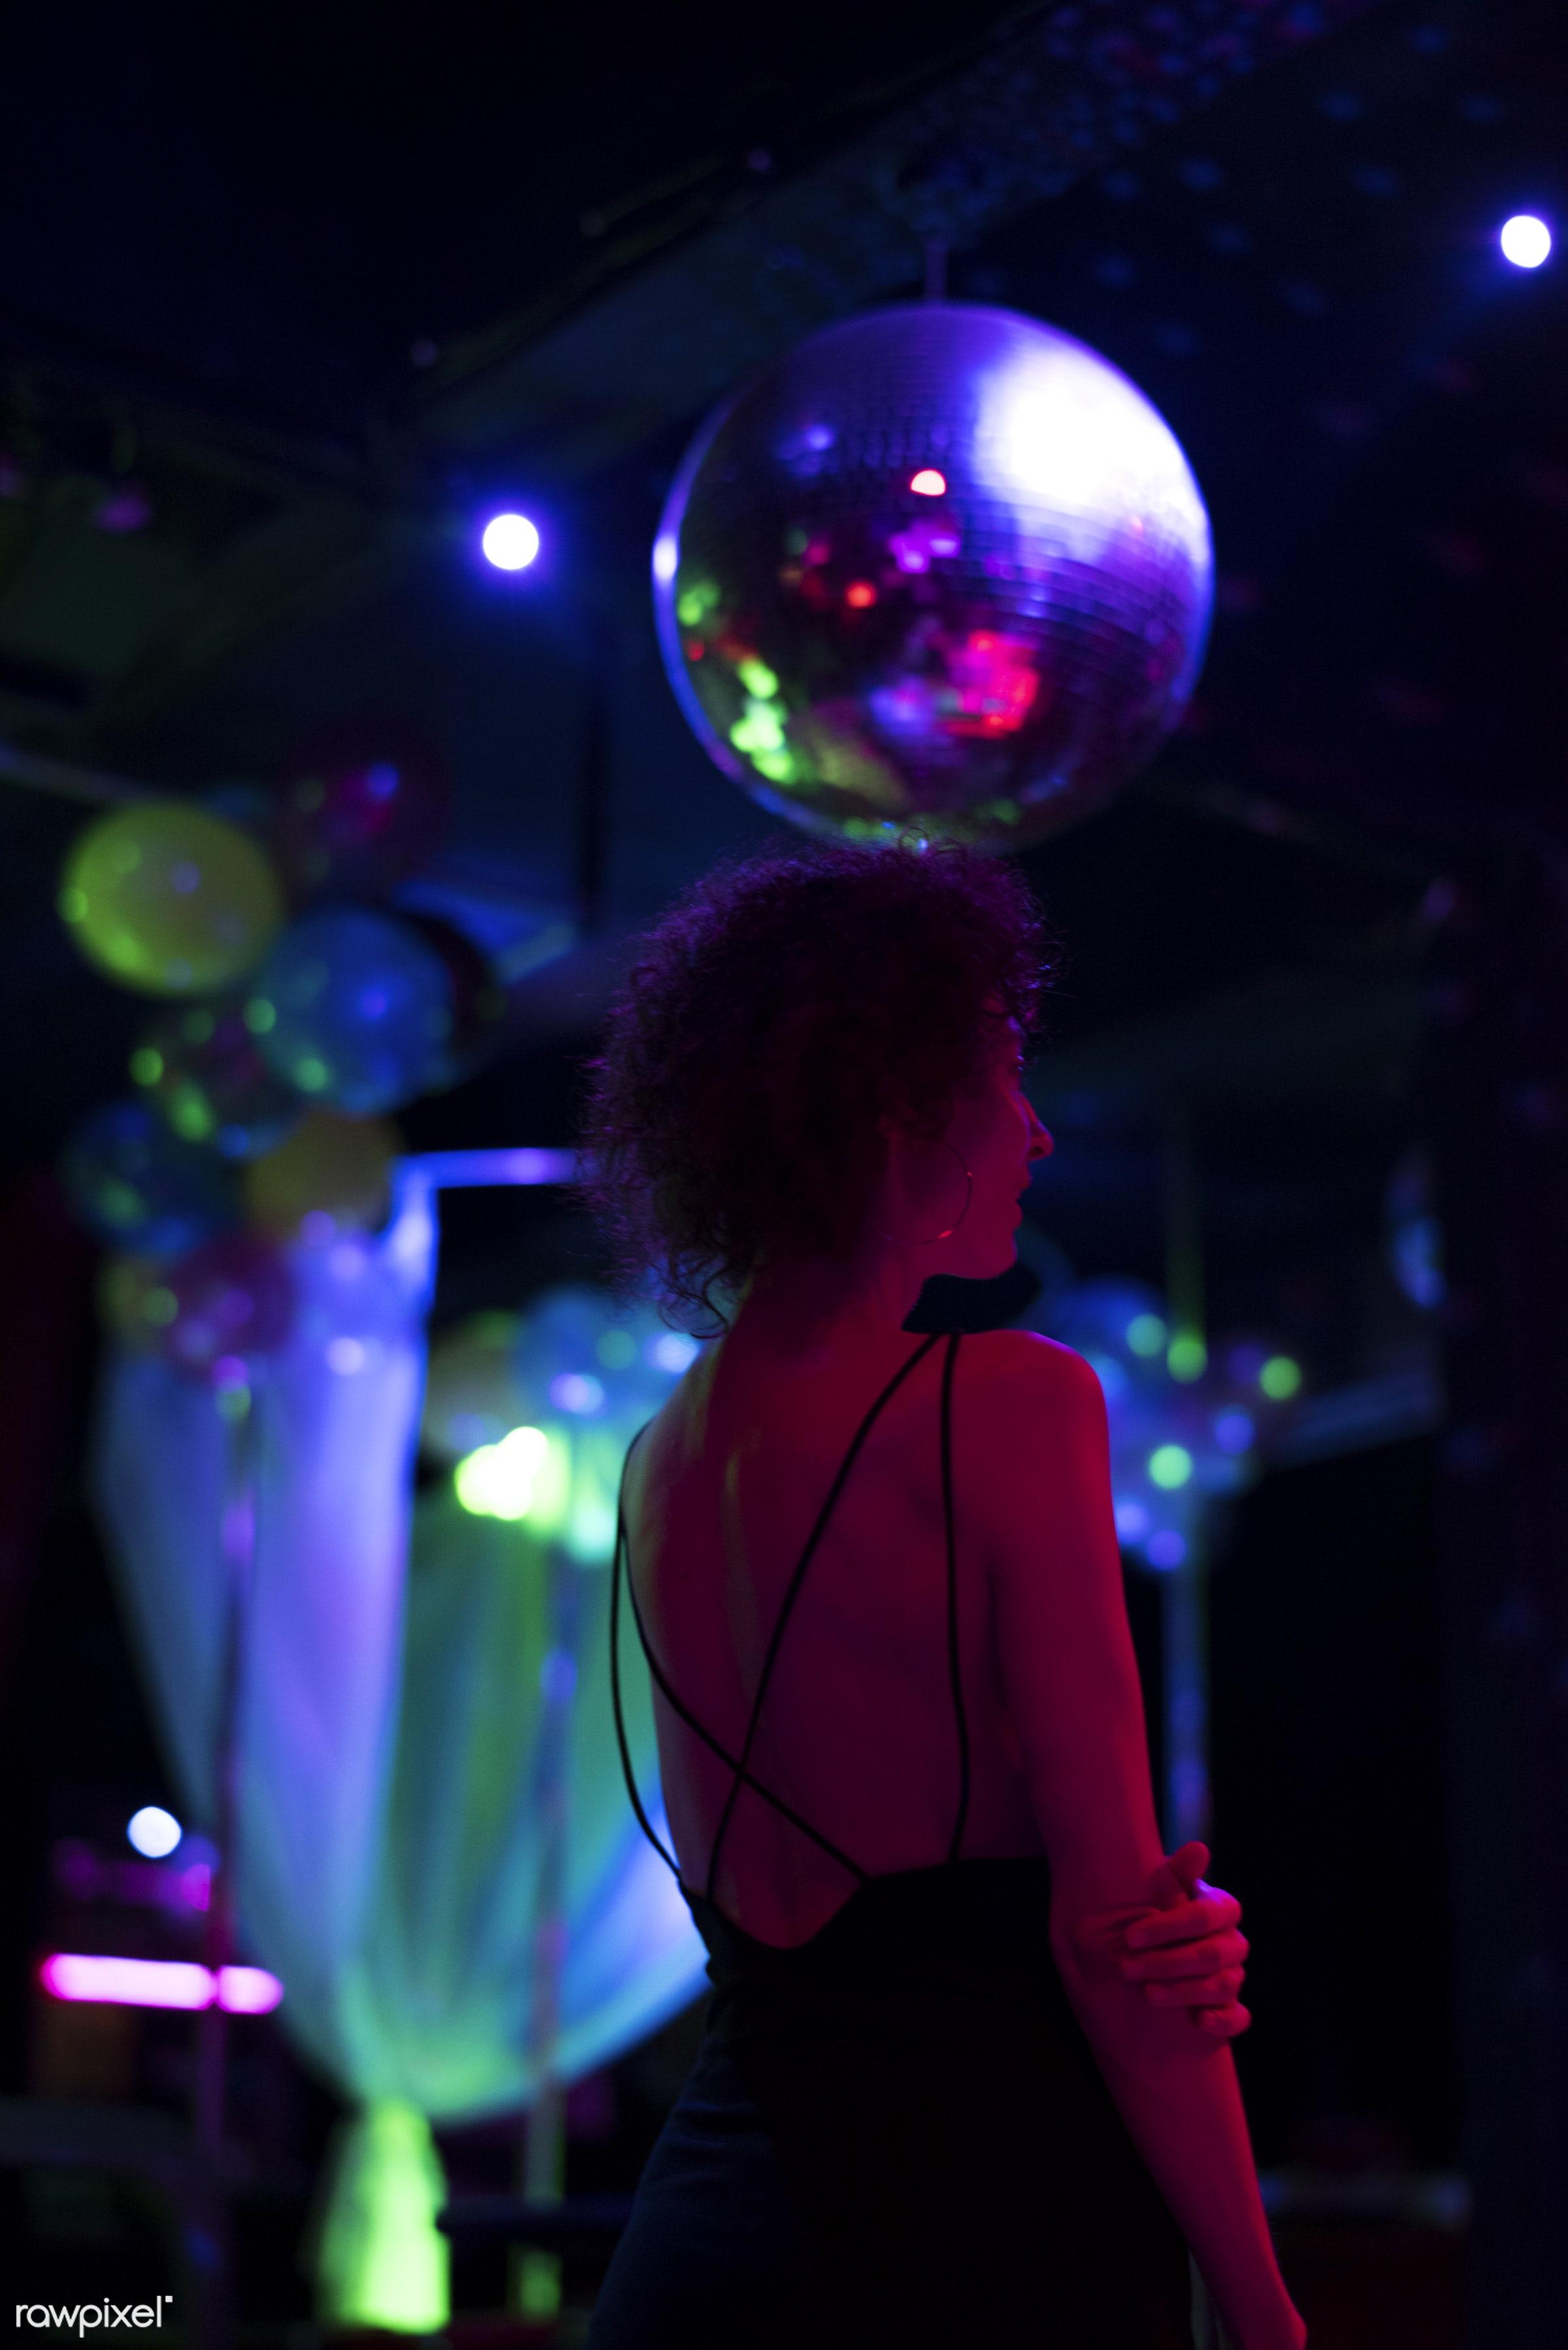 Woman on the dance floor of a club - night, alone, balloons, bar, celebration, club, clubbing, curly hair, dance floor,...